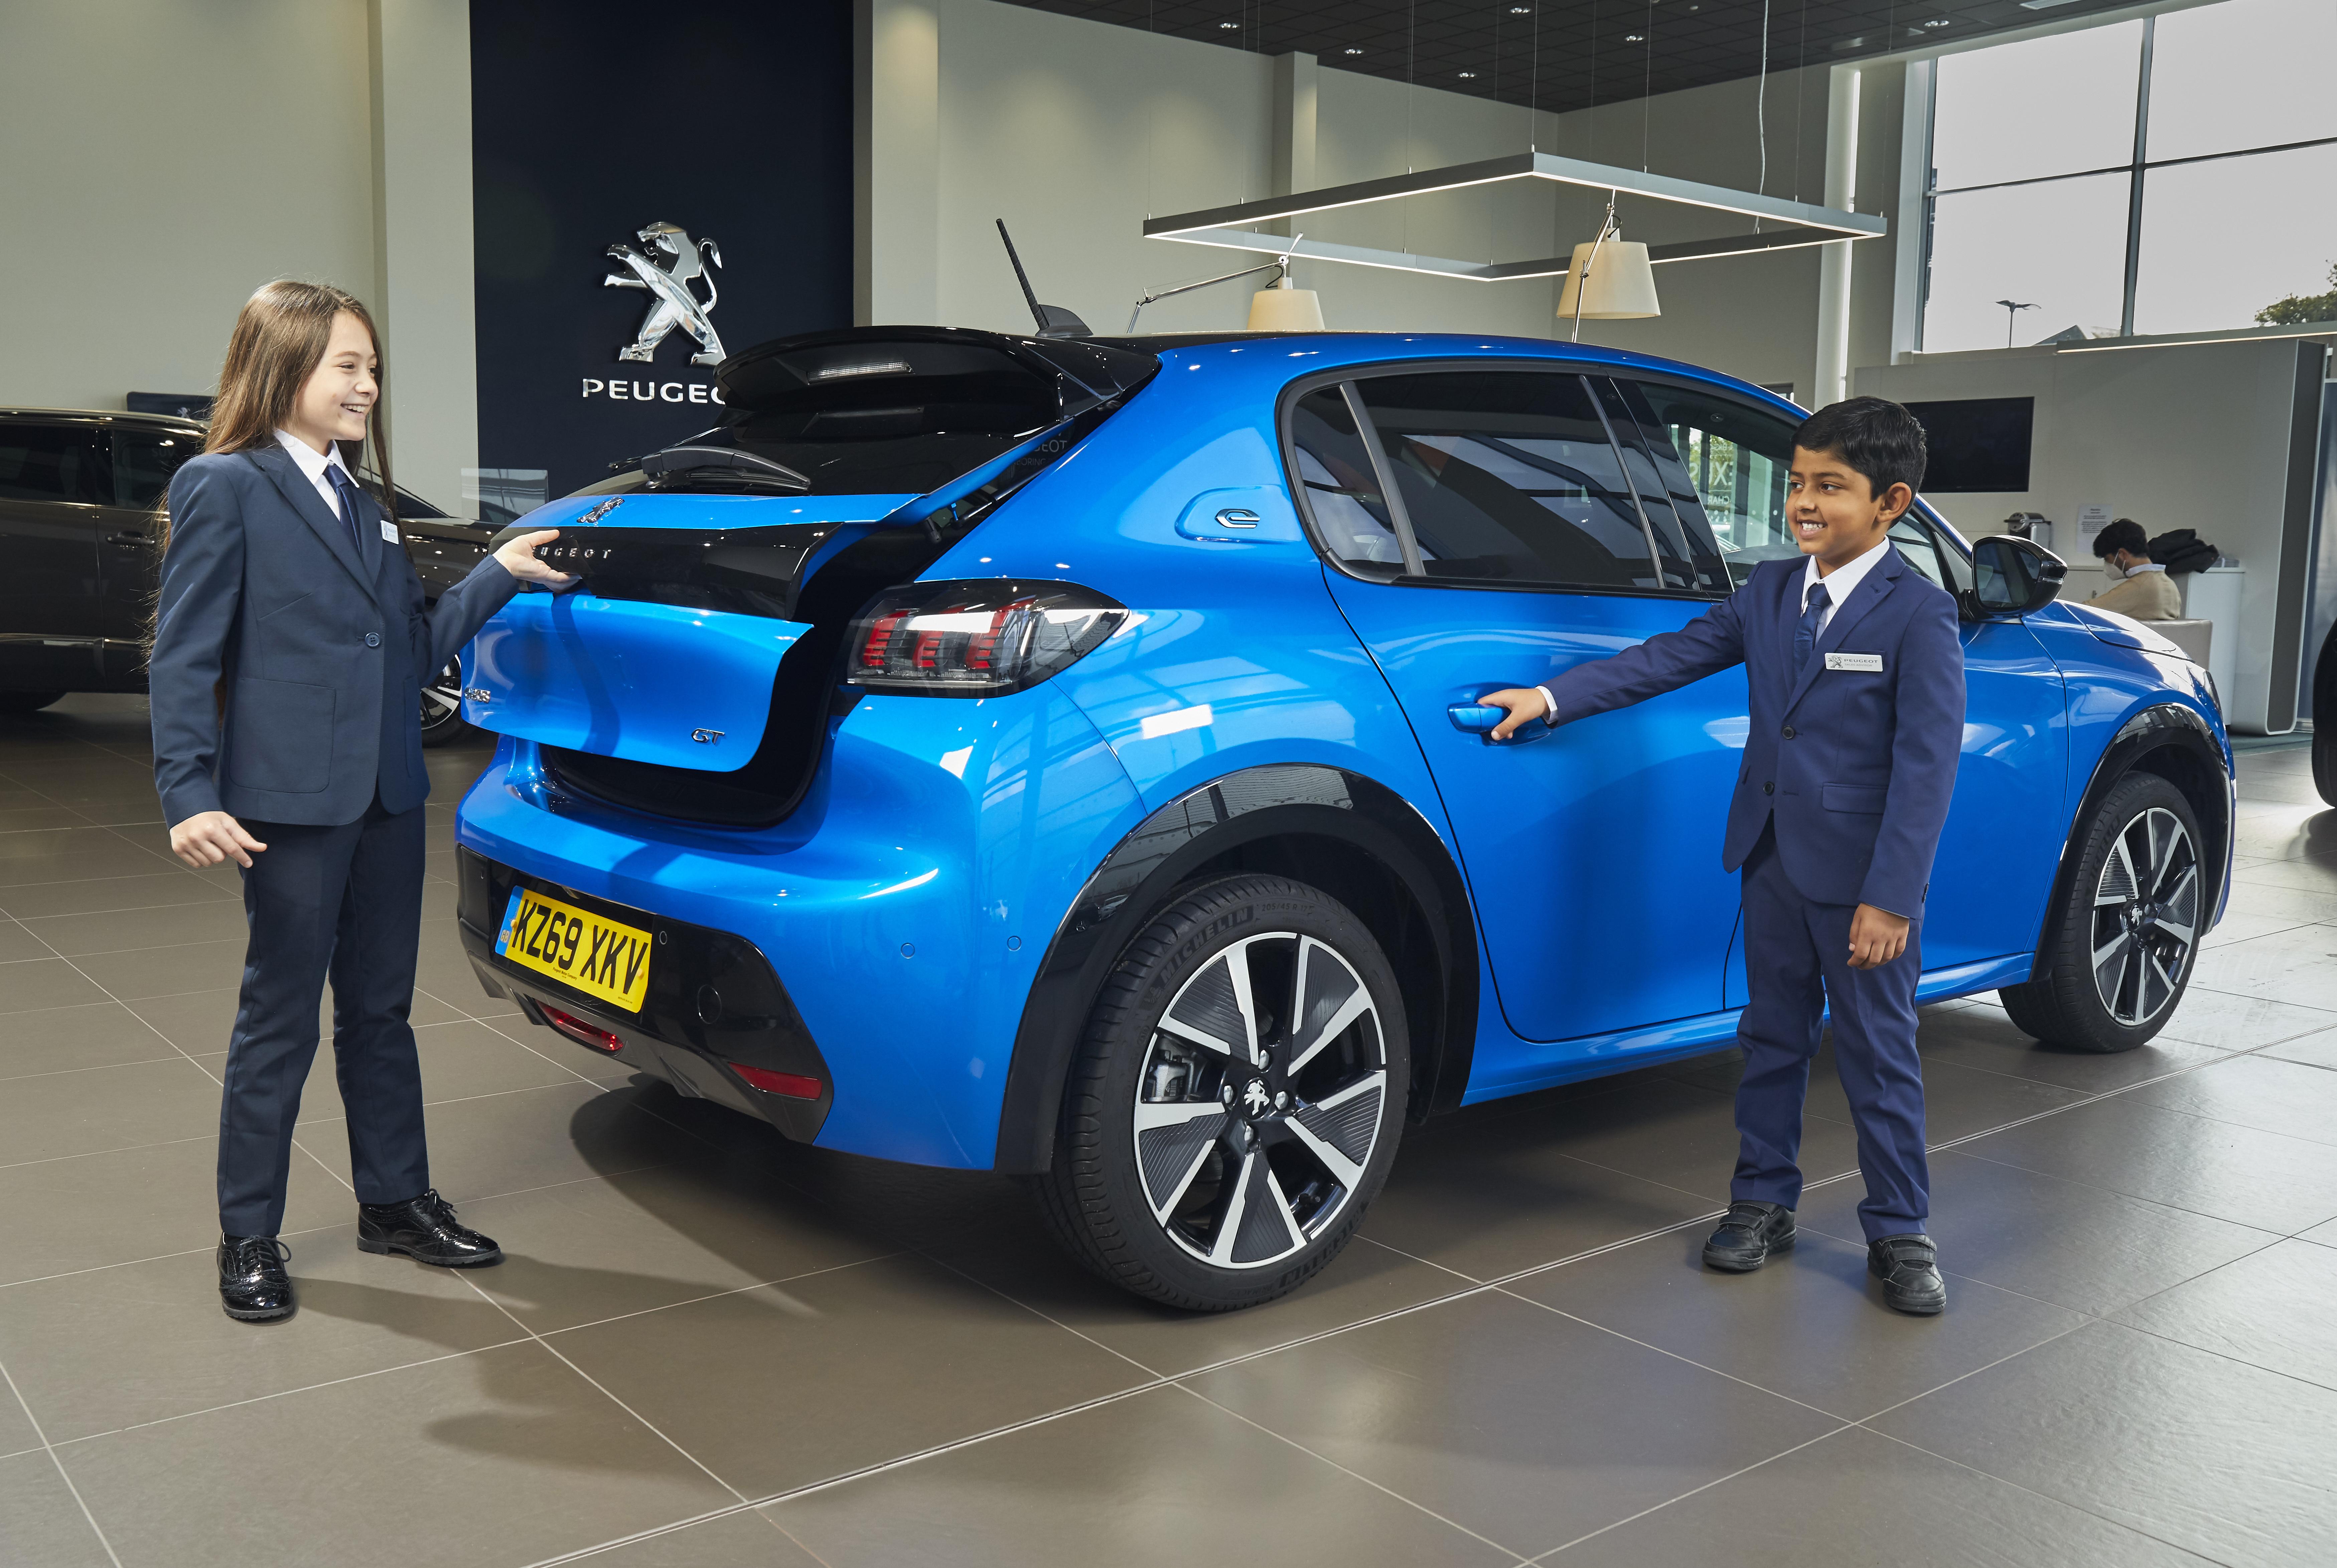 Children helping car buying process